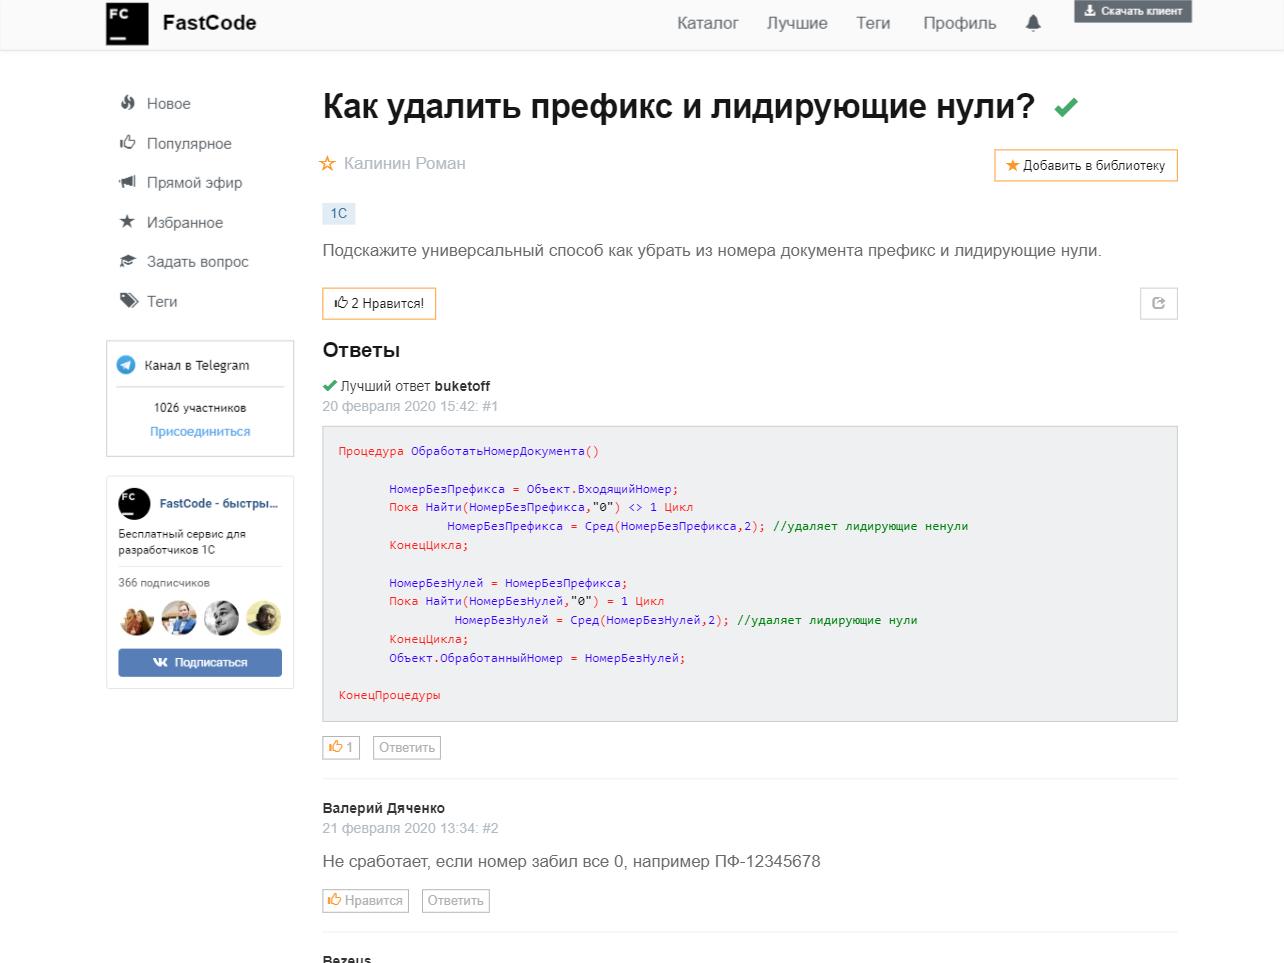 Image https://store.turboconf.ru/Content/Files/31C694EEA2260A37464FB9F25FA7B436FB000A06/FastCode_Answers.png